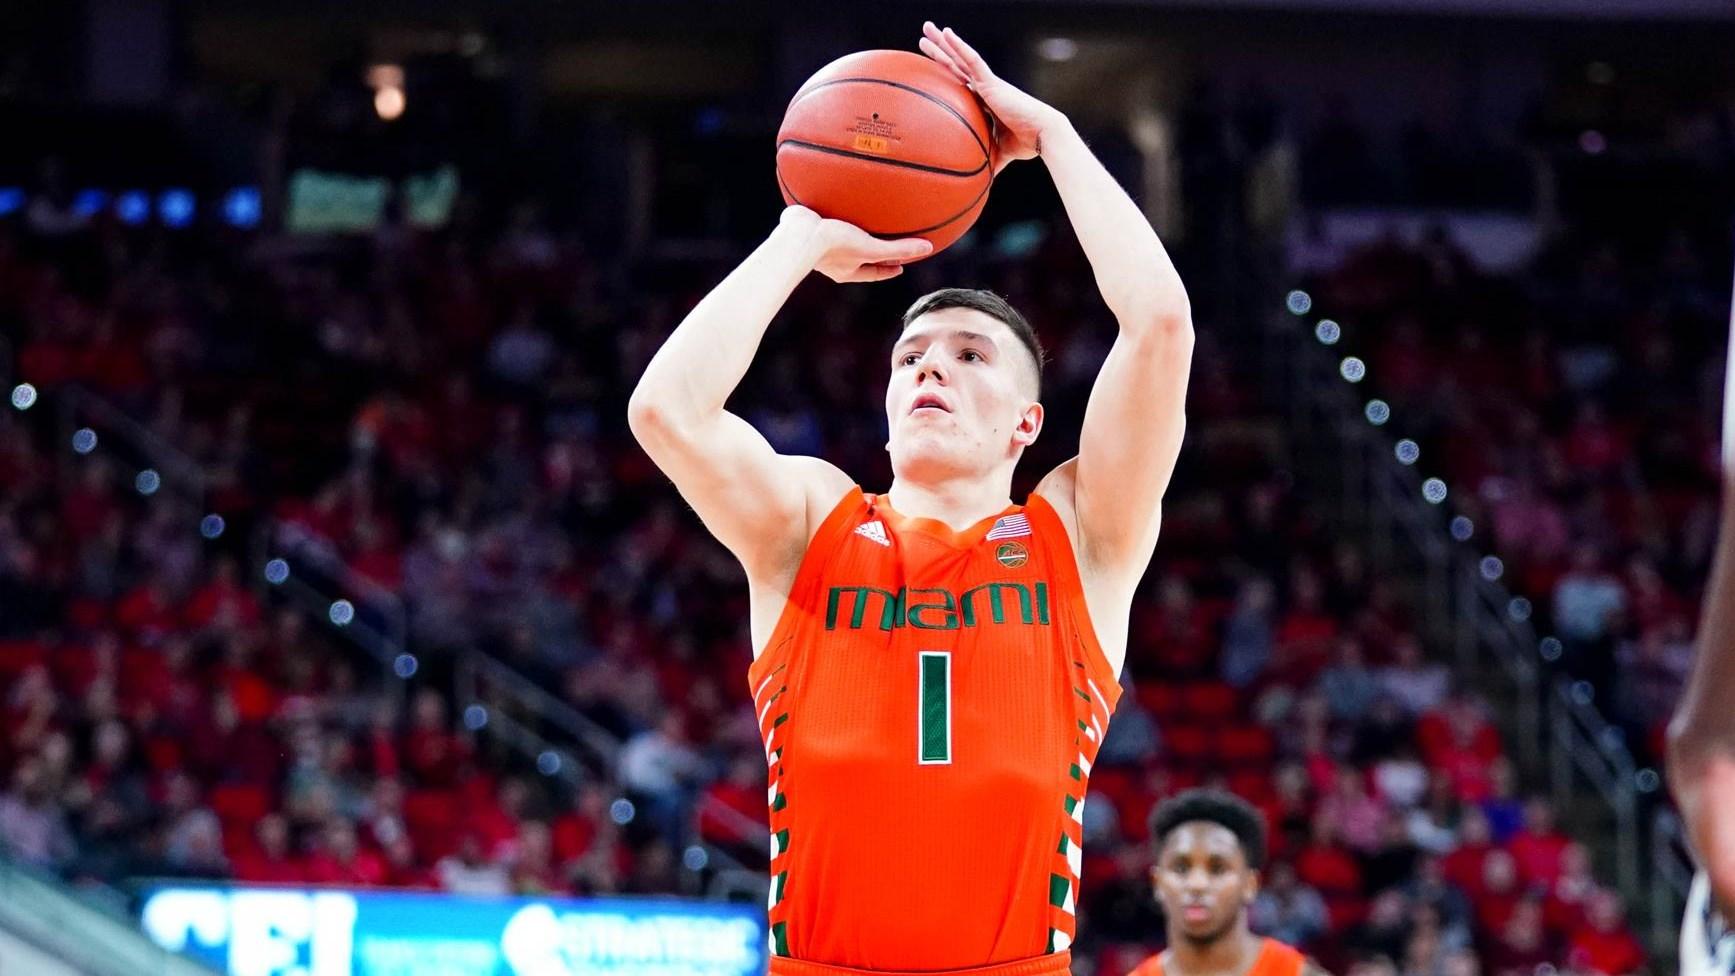 Aussies Abroad: Dejan Vasiljevic (Miami Hurricanes) - Basketball Draft  Central